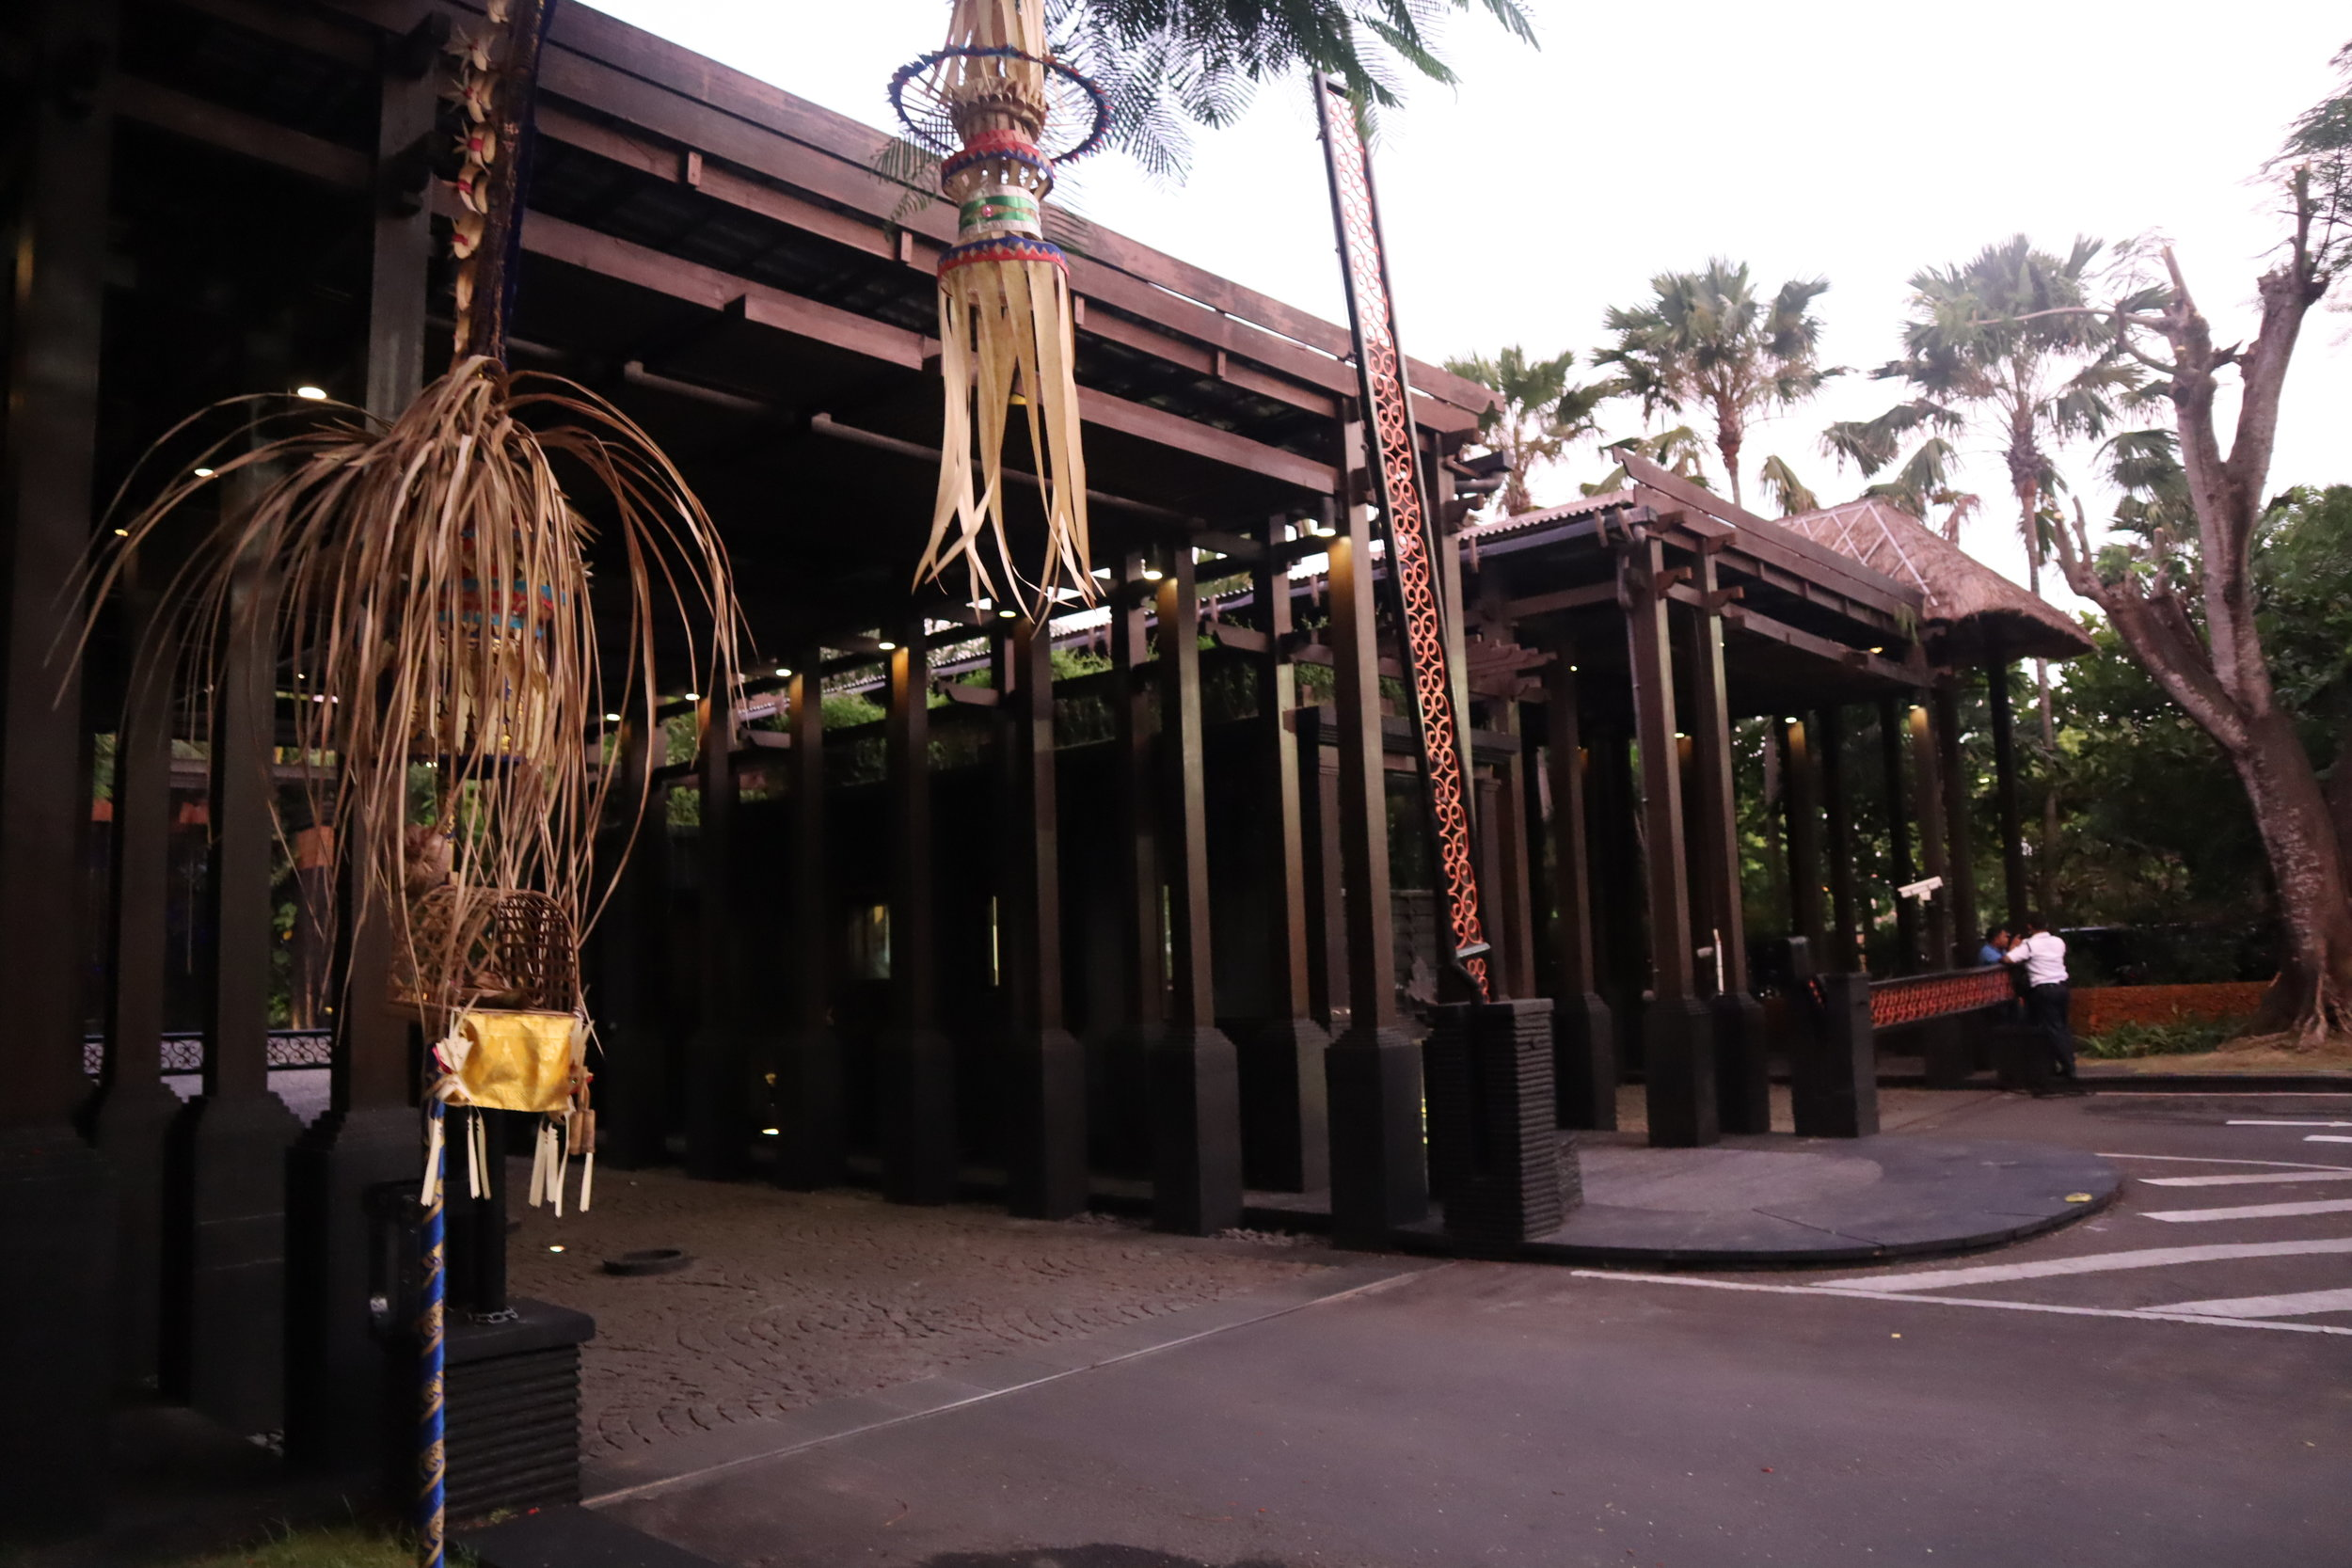 St. Regis Bali – Entrance